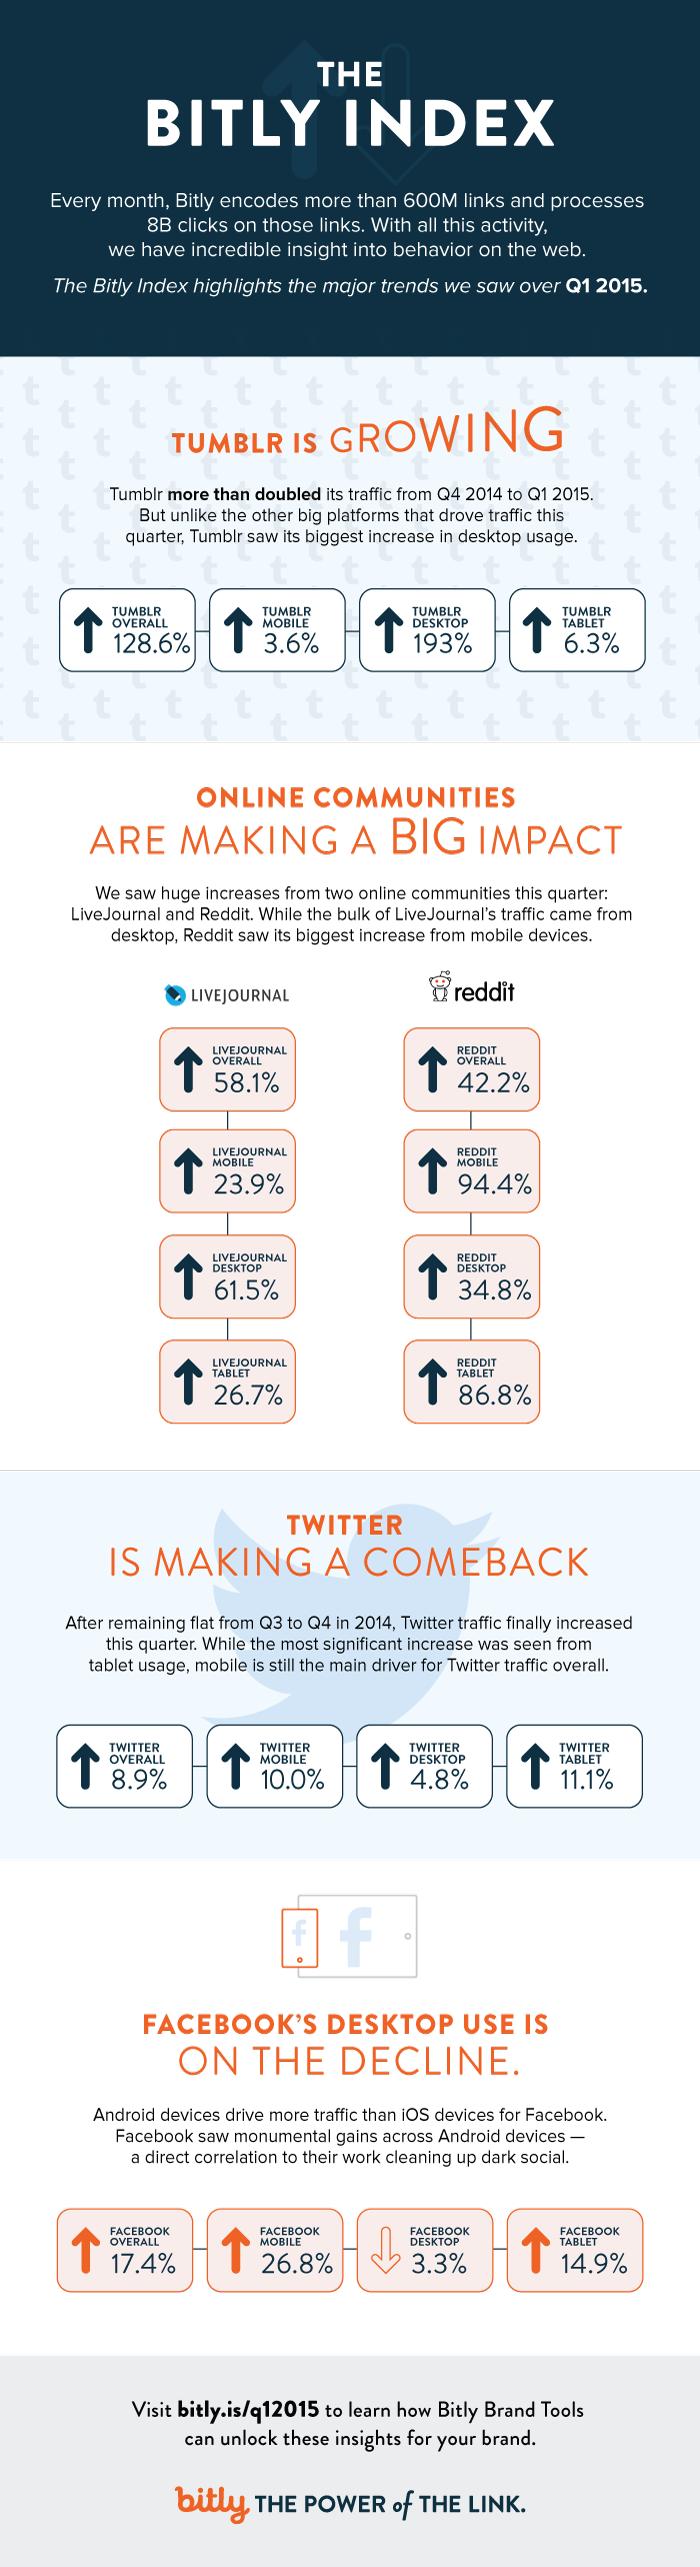 Tumblr, Reddit, Twitter, Facebook: Social Networking Trends Q1 2015 - #infographic